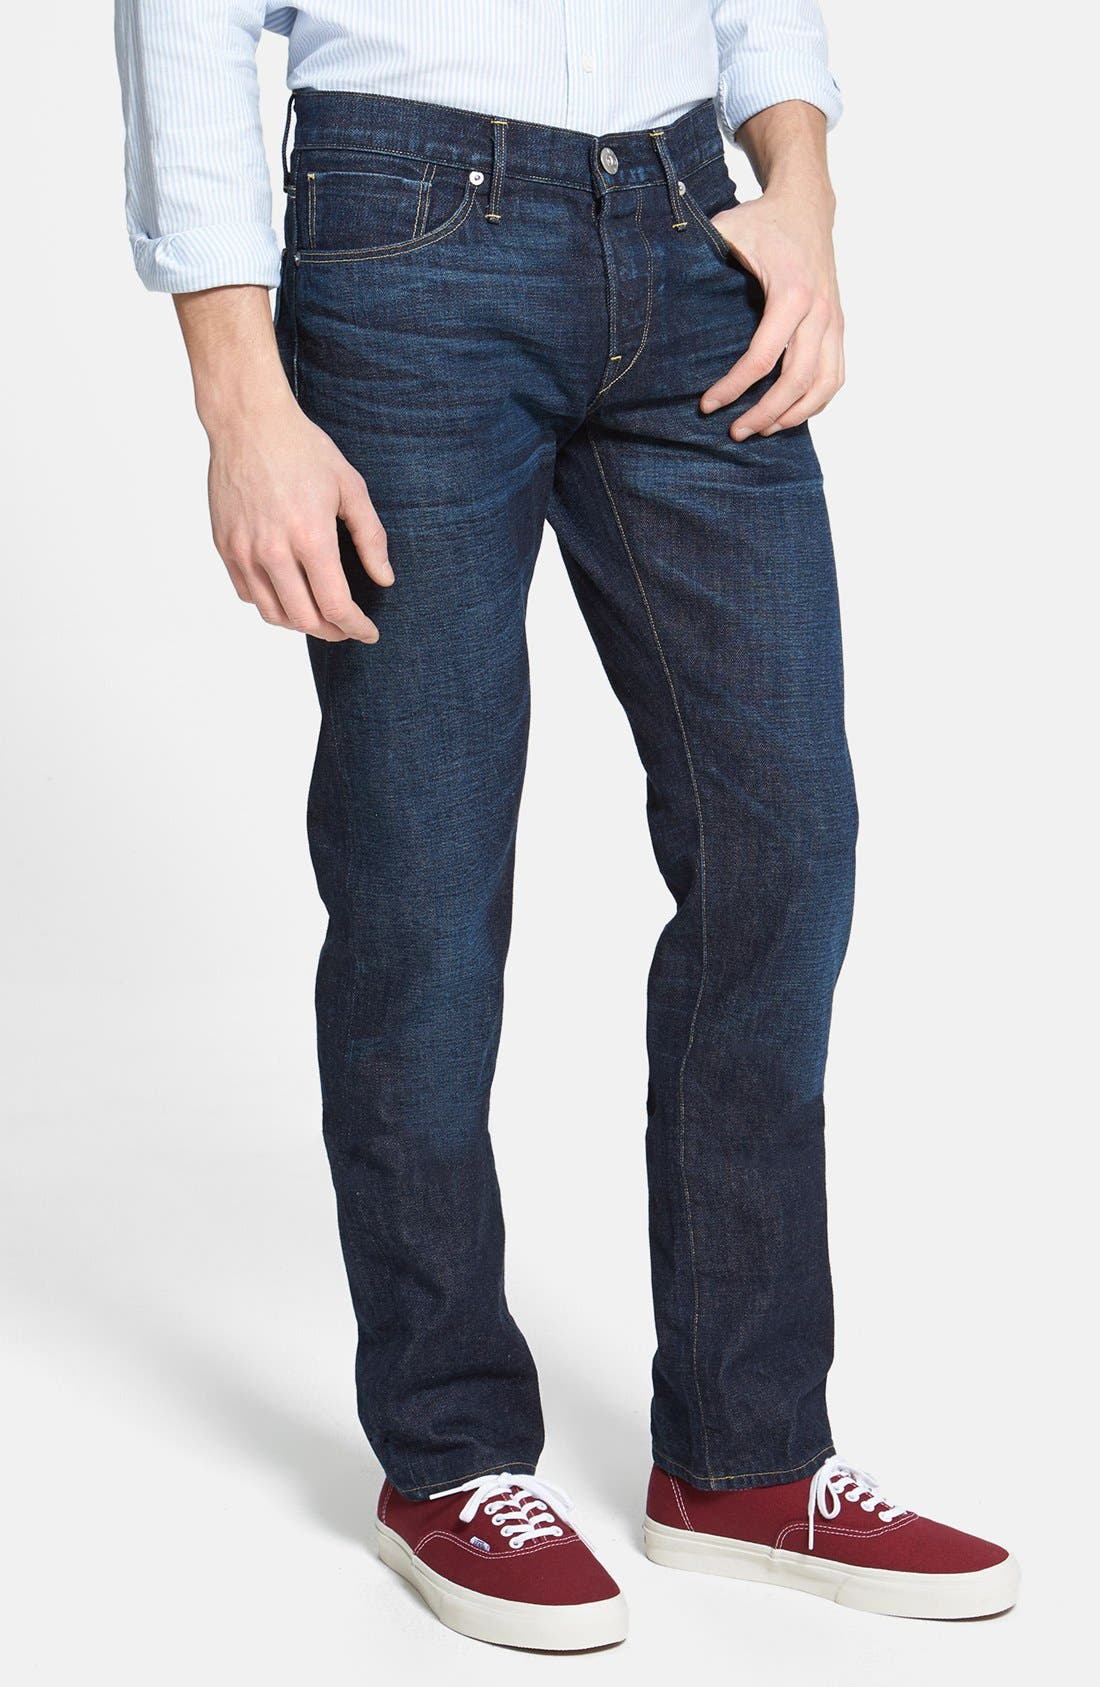 Alternate Image 1 Selected - 3x1 NYC 'M4' Straight Leg Selvedge Jeans (Walker)